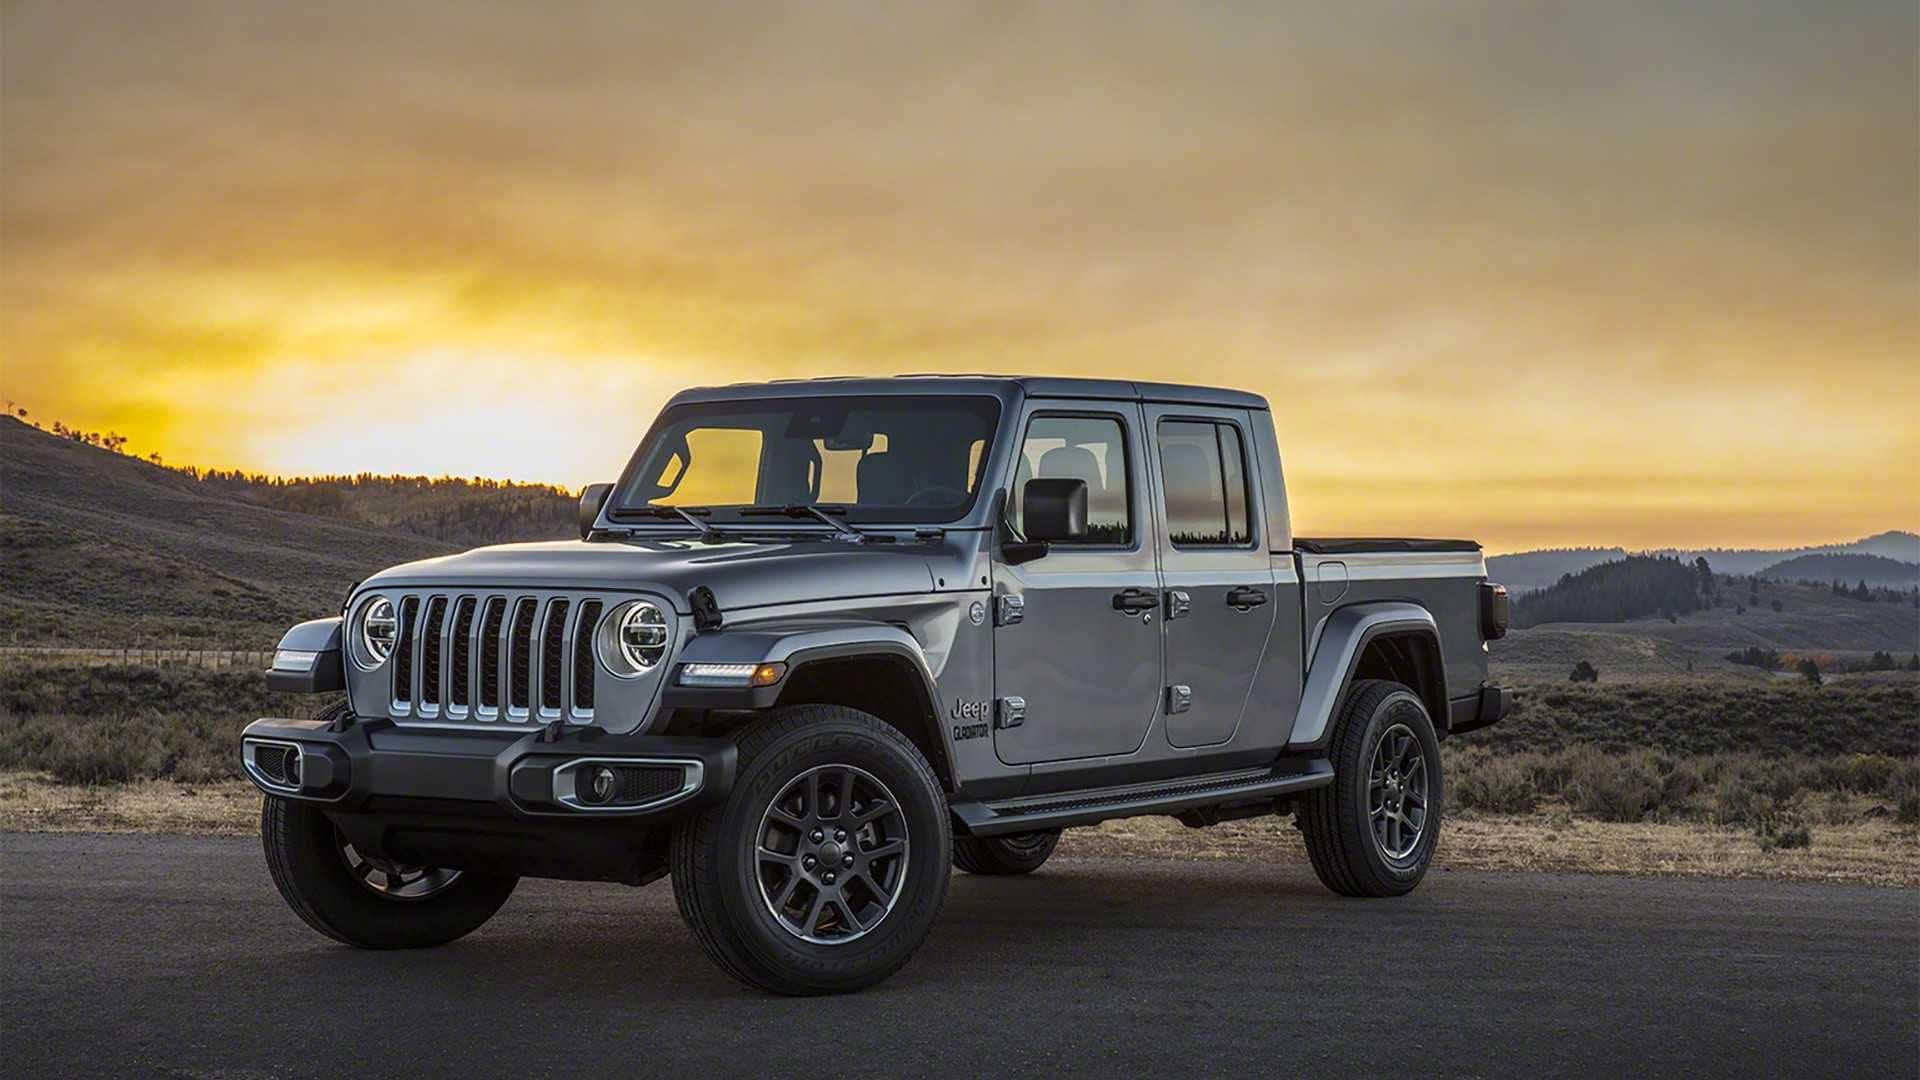 Unveiled: 2020 Jeep Gladiator